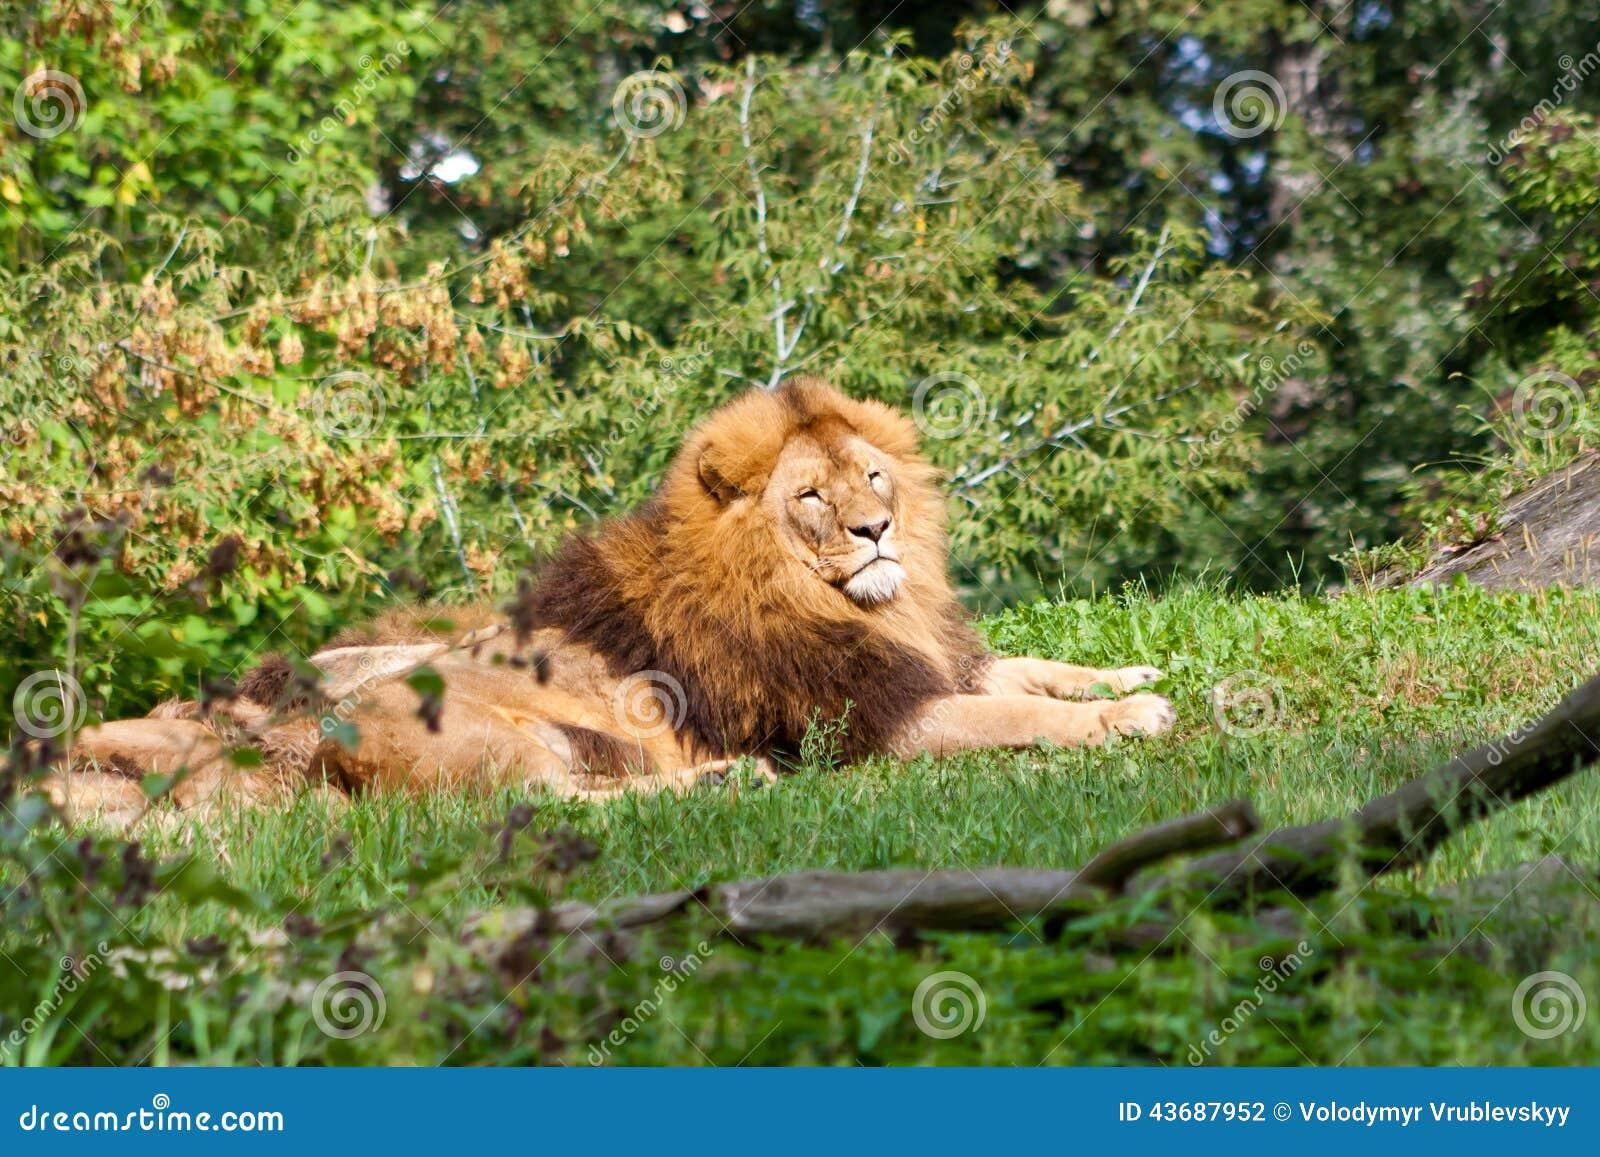 King of animals  stock photo  Image of lion, predator - 43687952